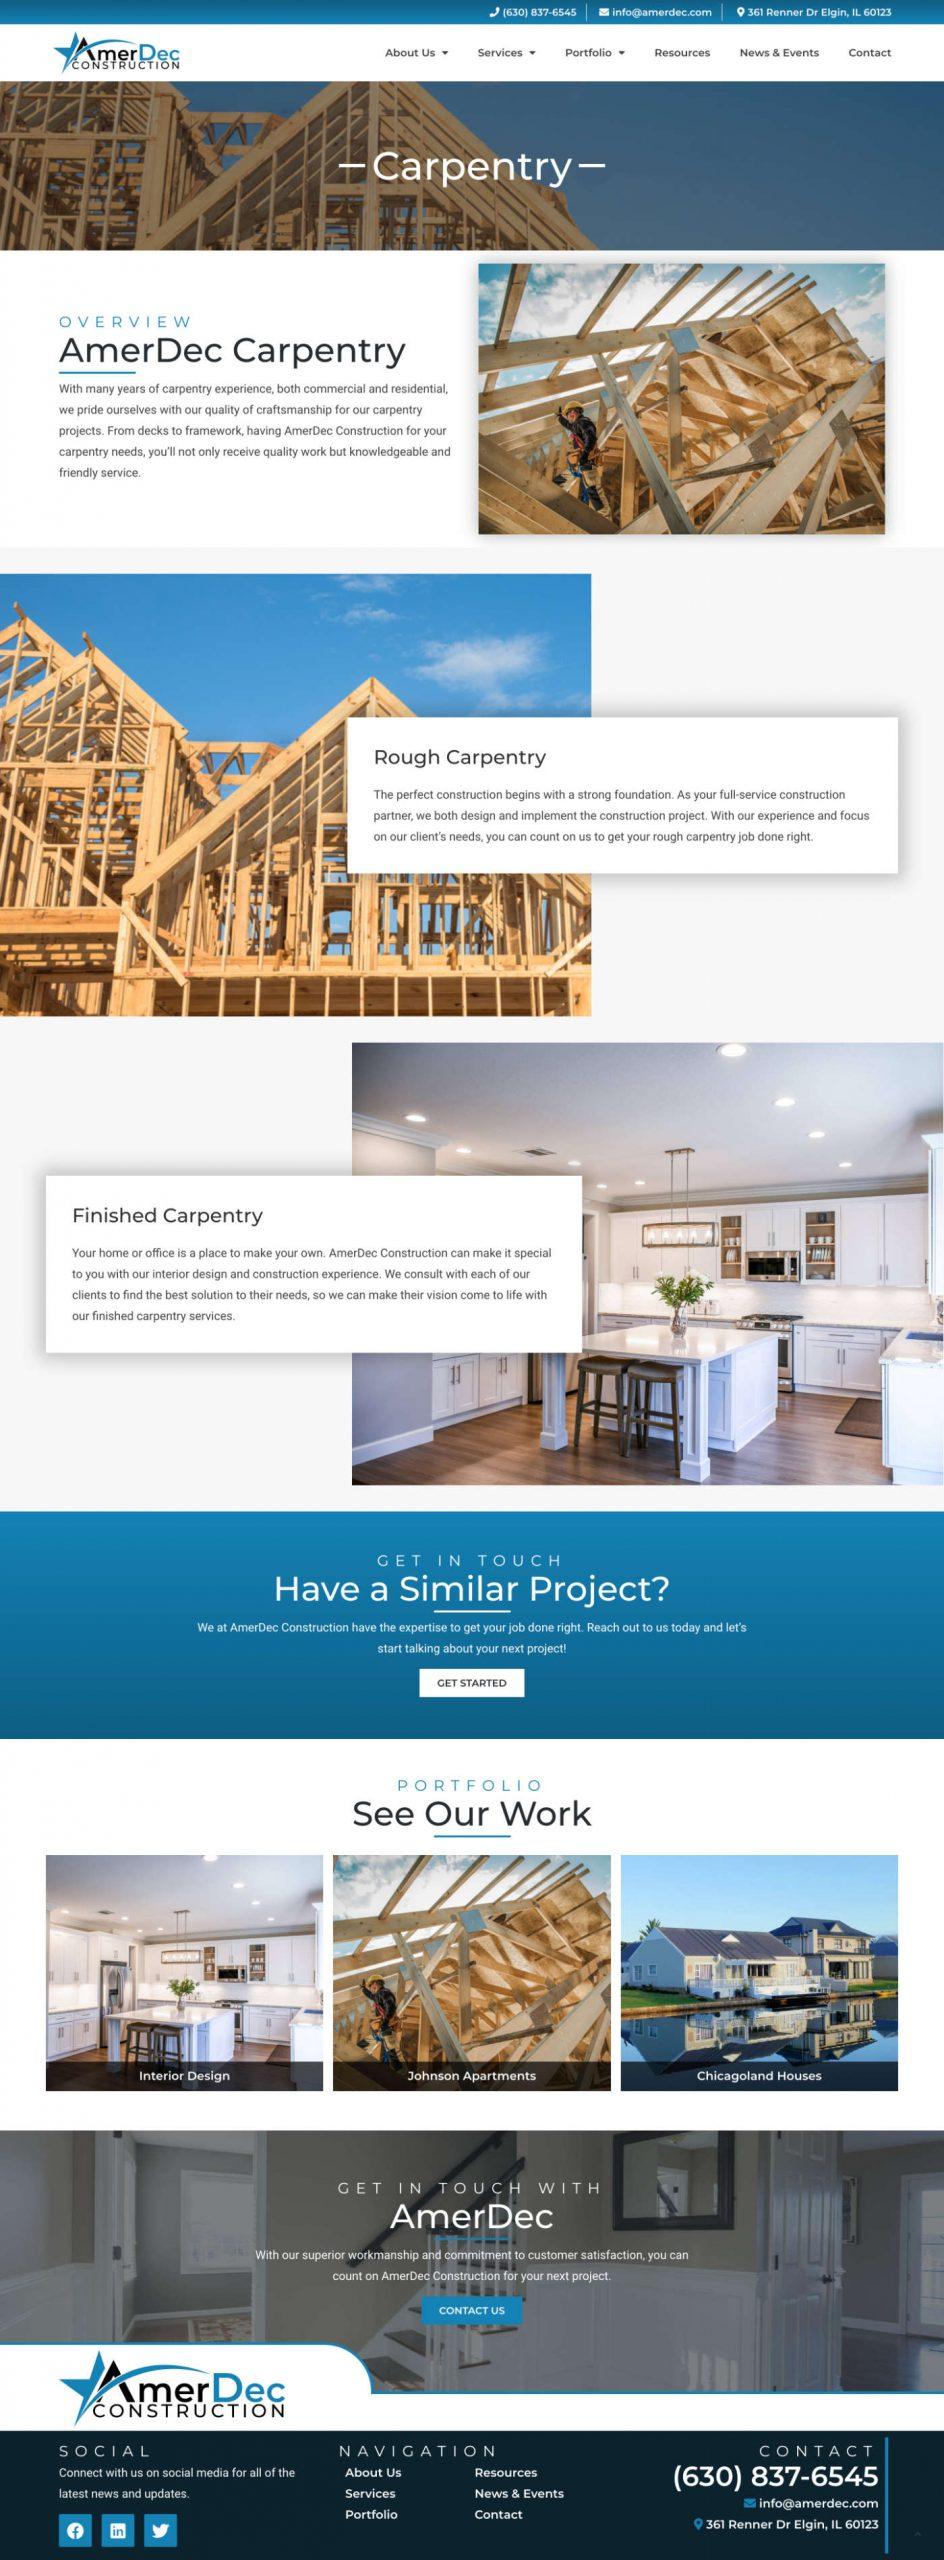 Amerdec Carpentry